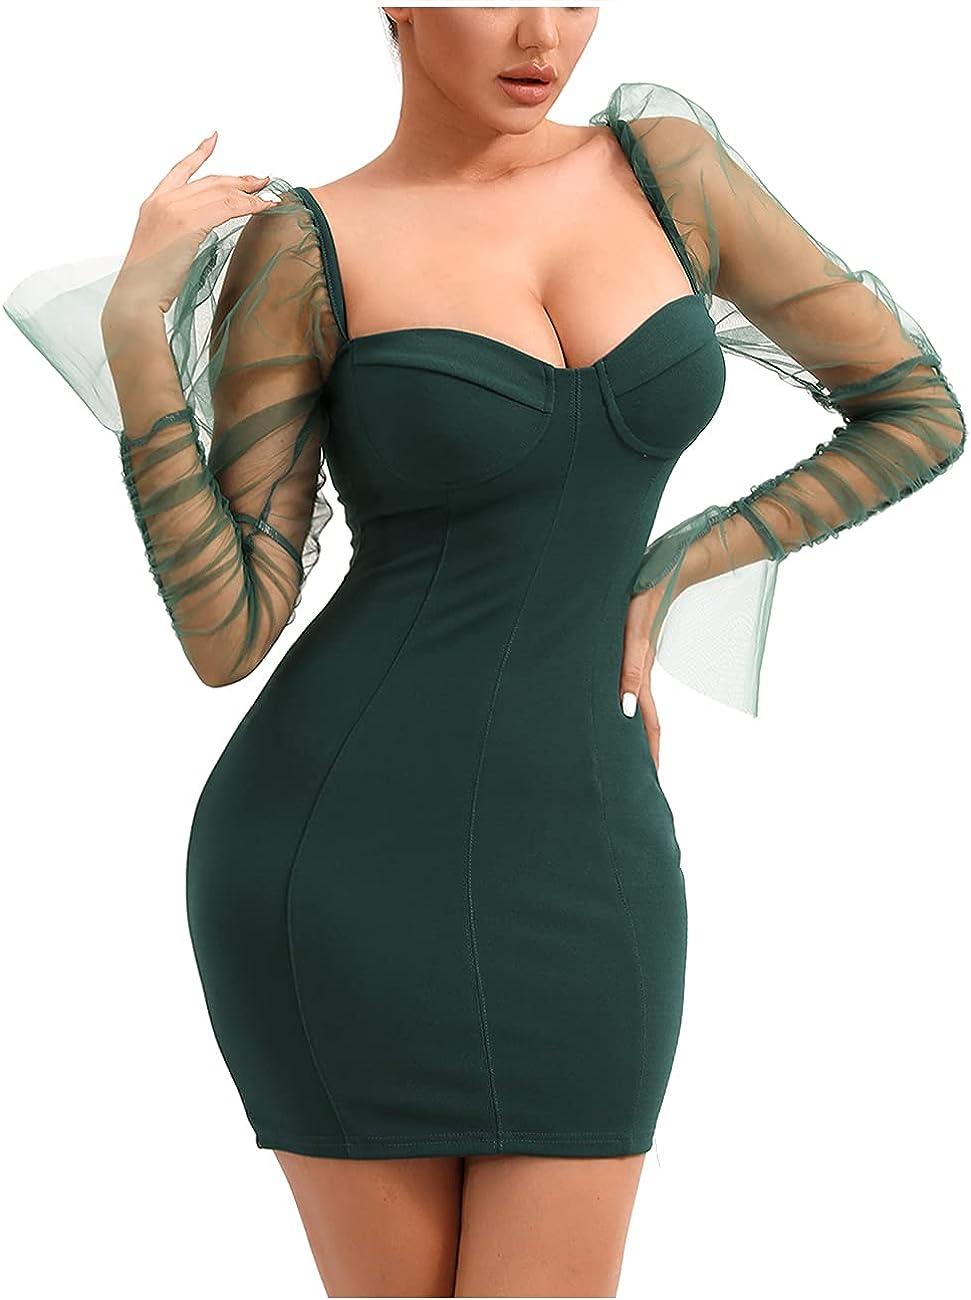 L'VOW Womens Sexy Long Puff Sleeves Dress Mesh Sheer Backless Skirt See-Through Mini Dress